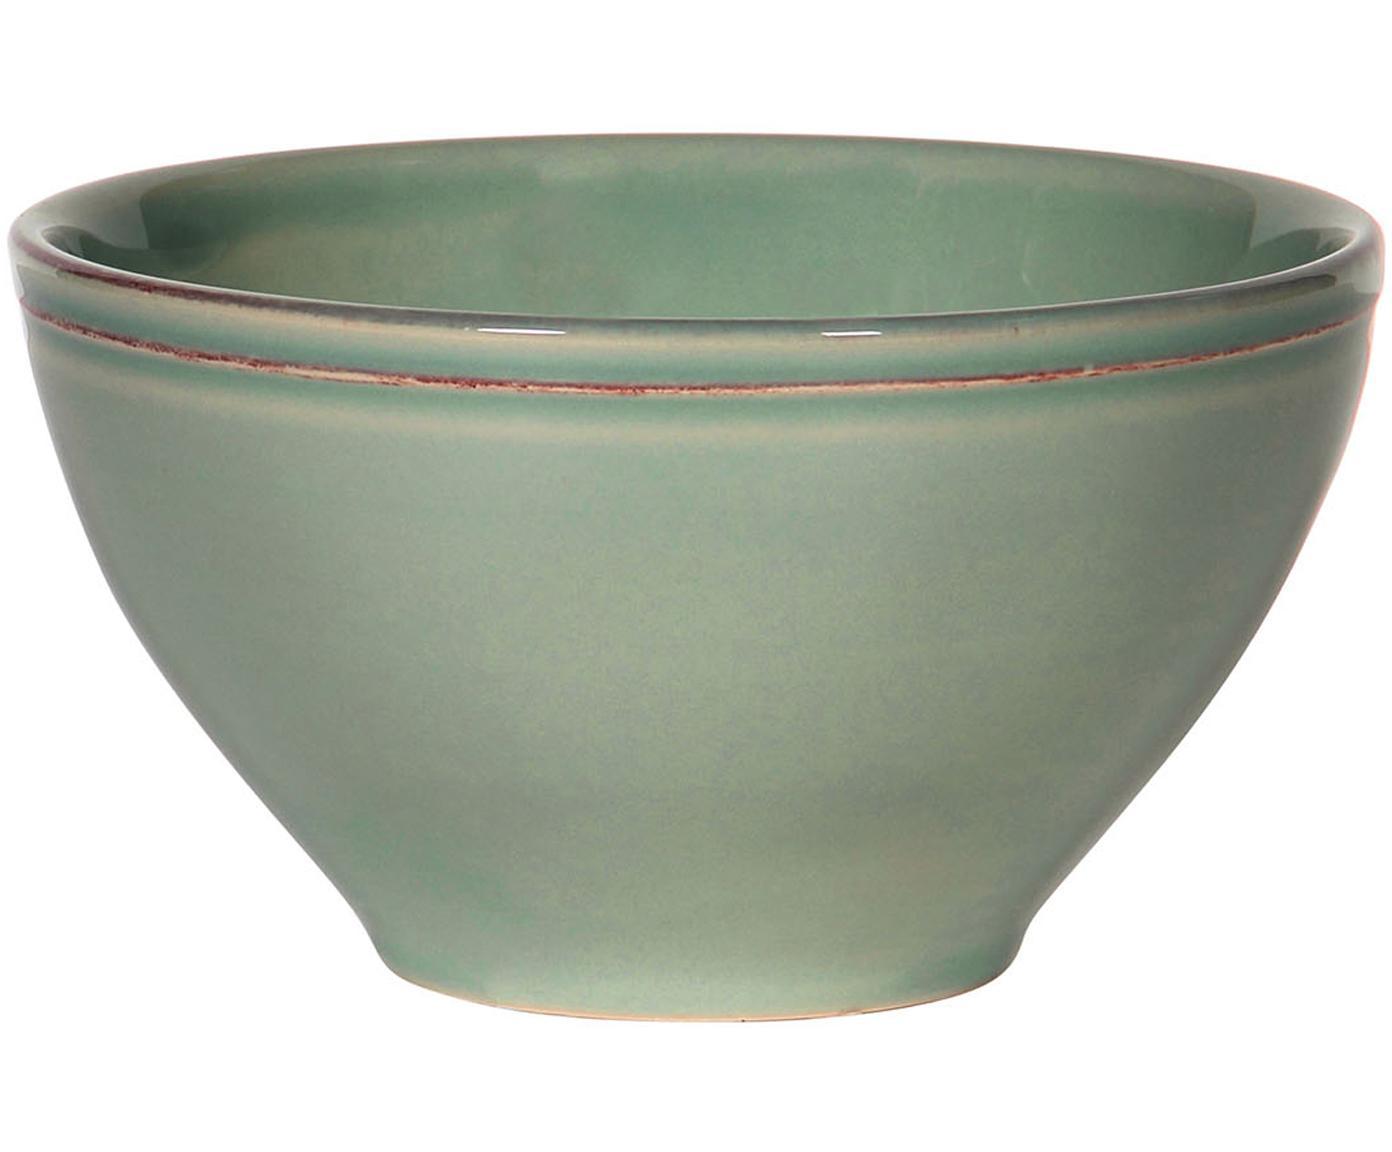 Cuencos Cosntance, 2uds., estilo rústico, Cerámica, Verde salvia, Ø 15 x Al 9 cm